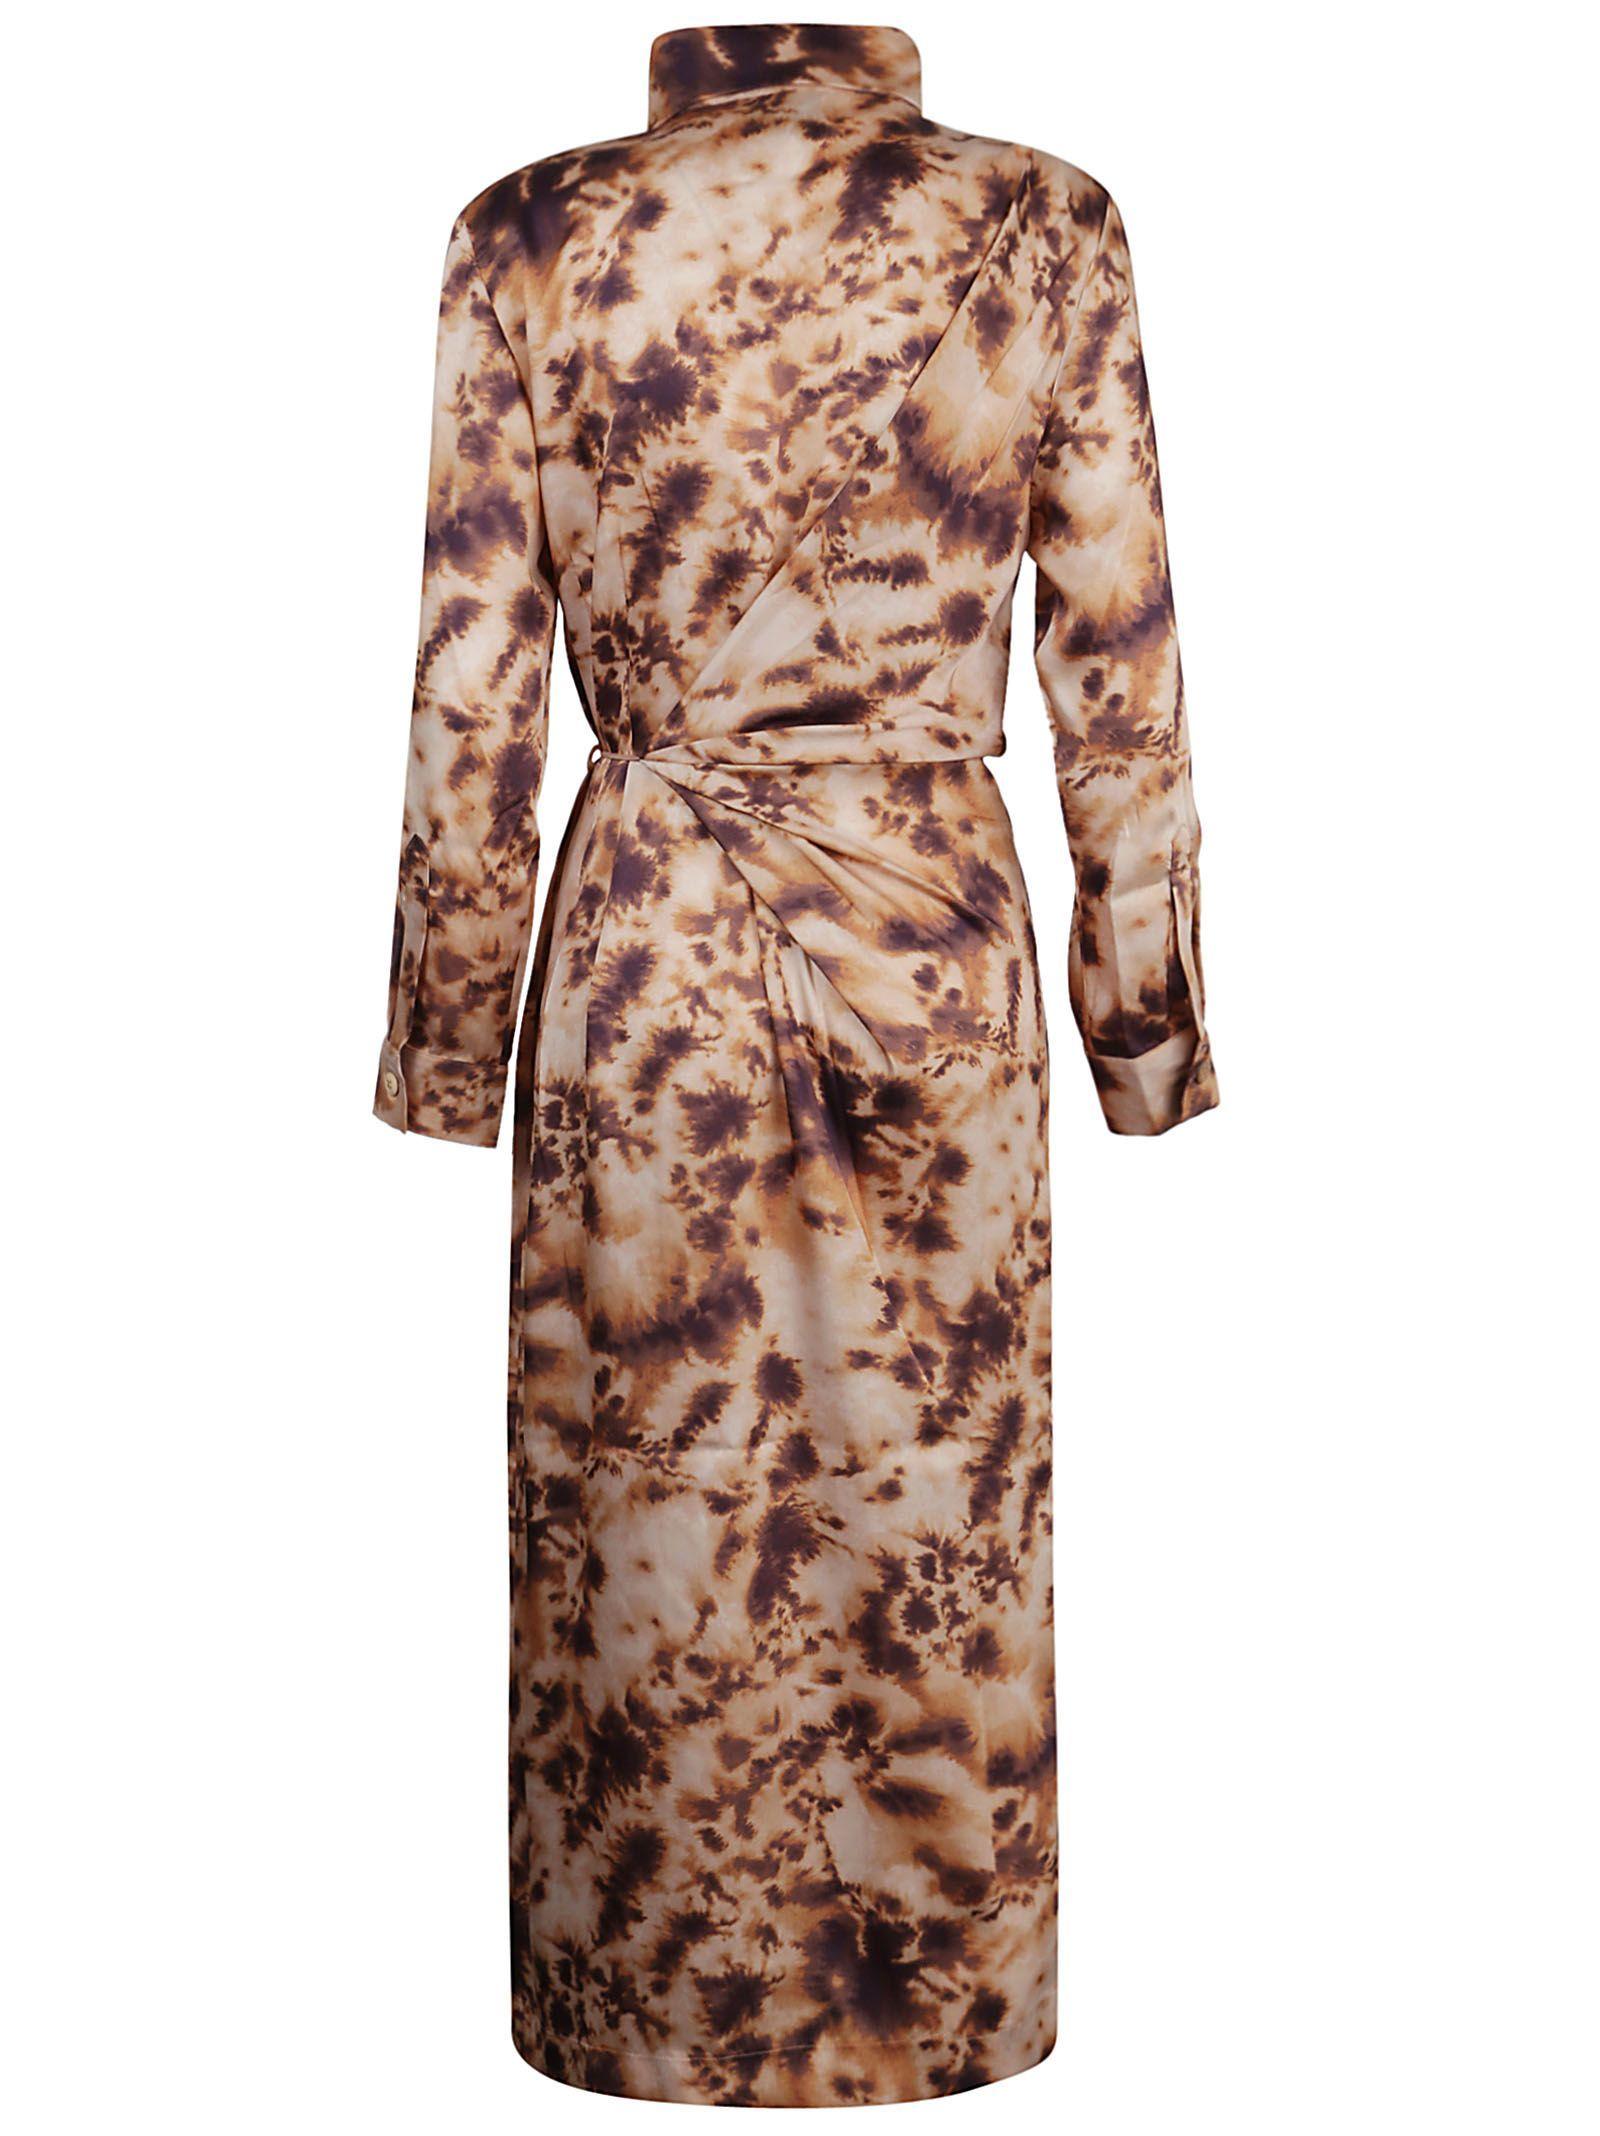 NANUSHKA WOMEN'S BISSOTIE BEIGE POLYESTER DRESS